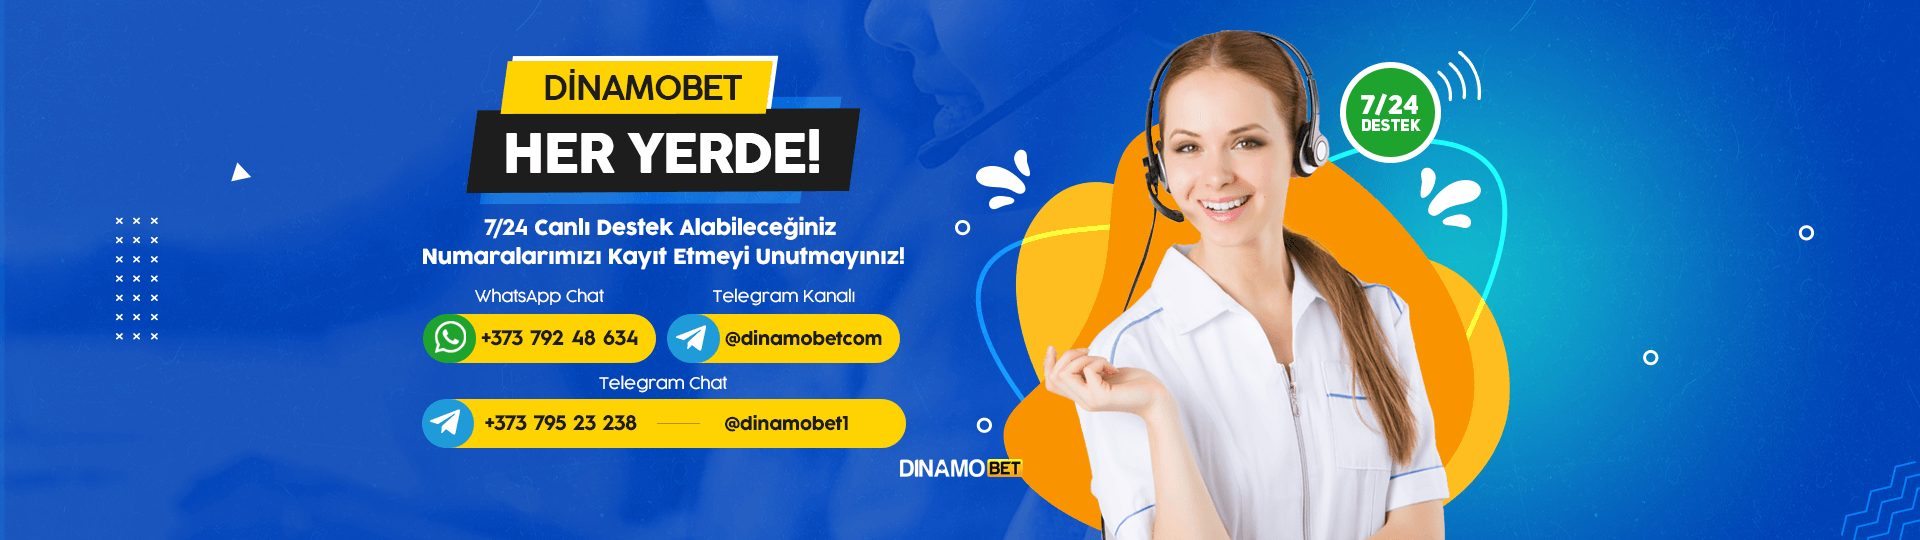 Dinamobet Giriş